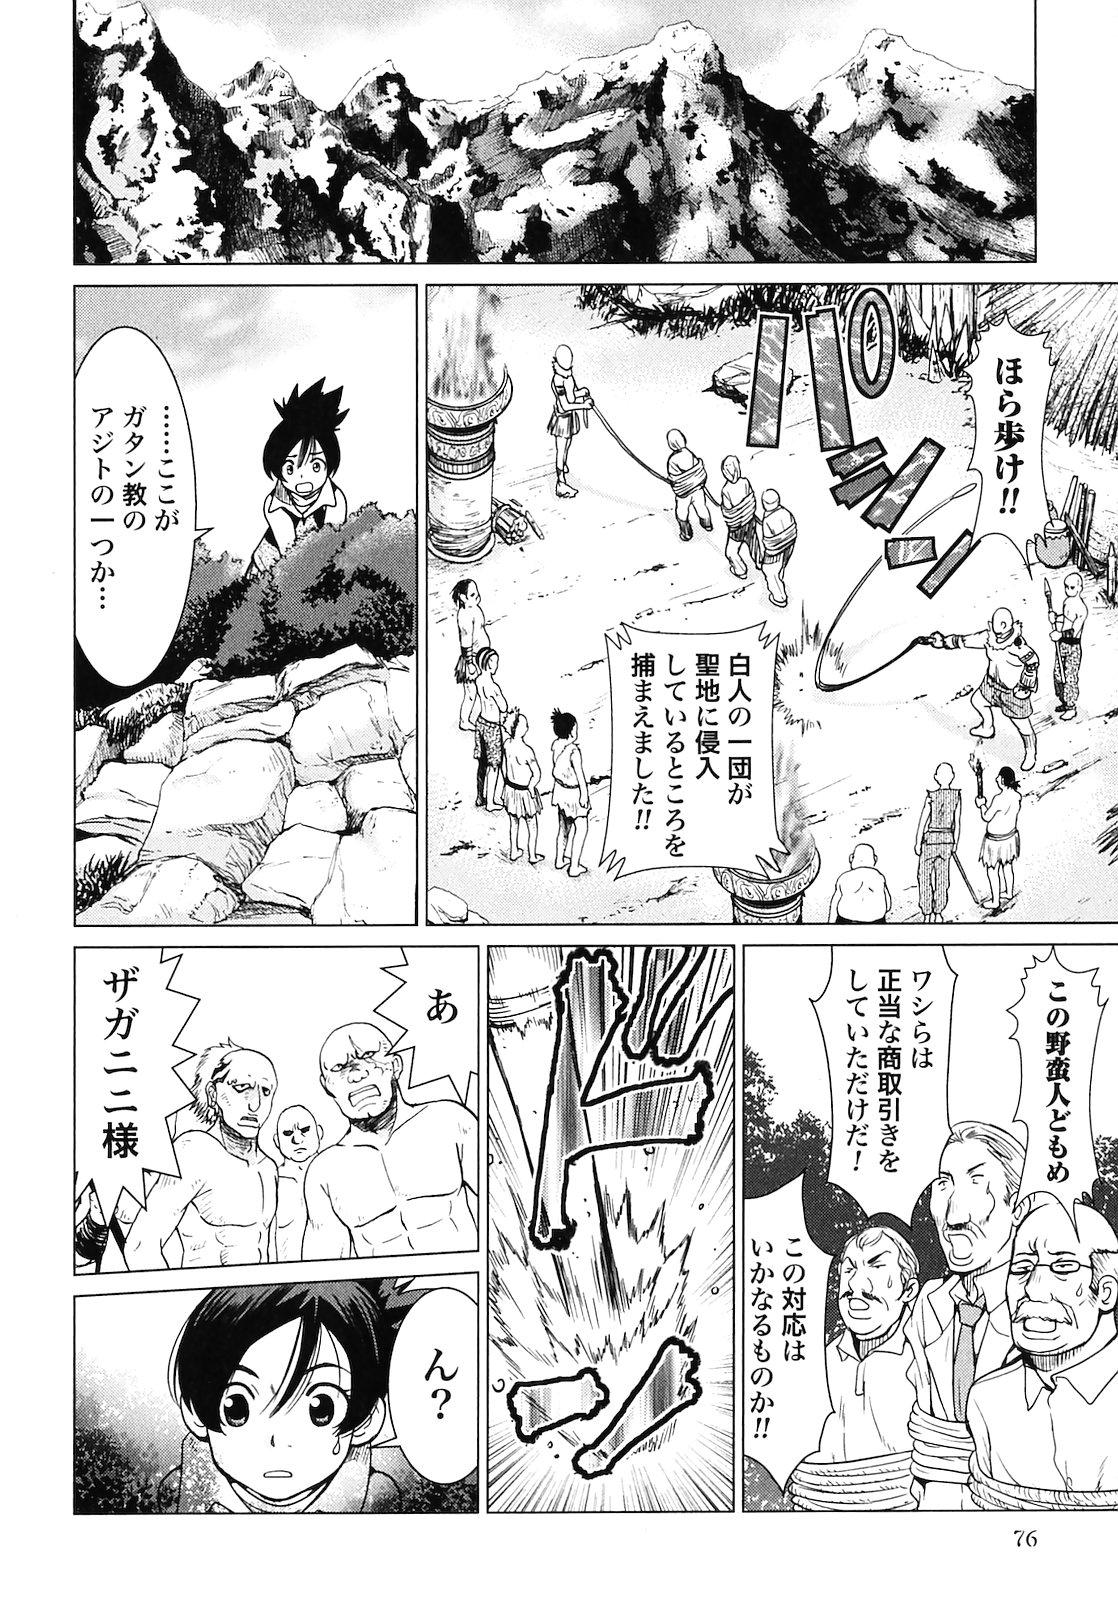 Makyo no Shanana Vol.02 77